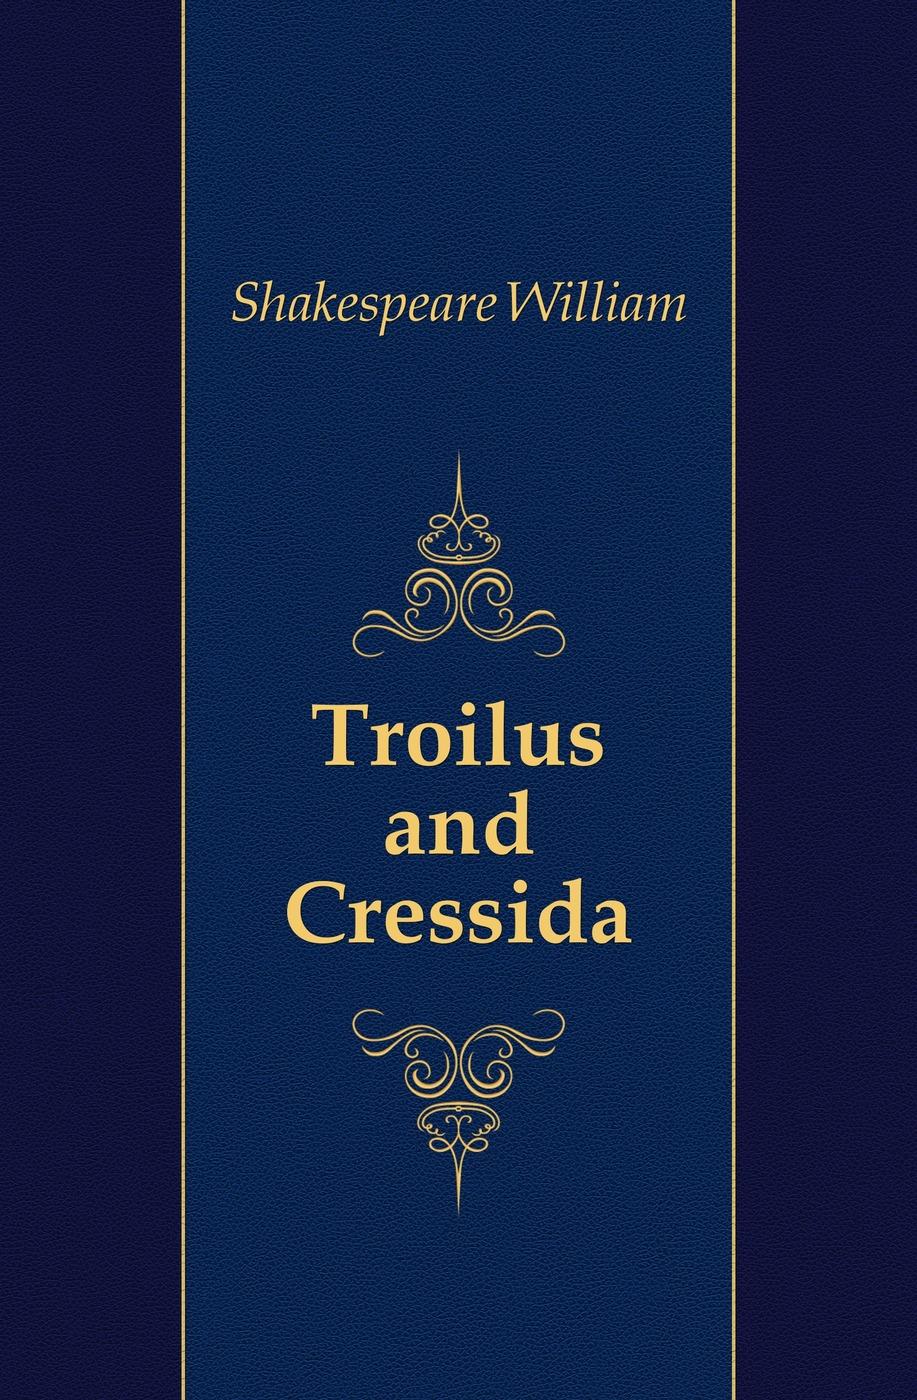 Уильям Шекспир Troilus and Cressida